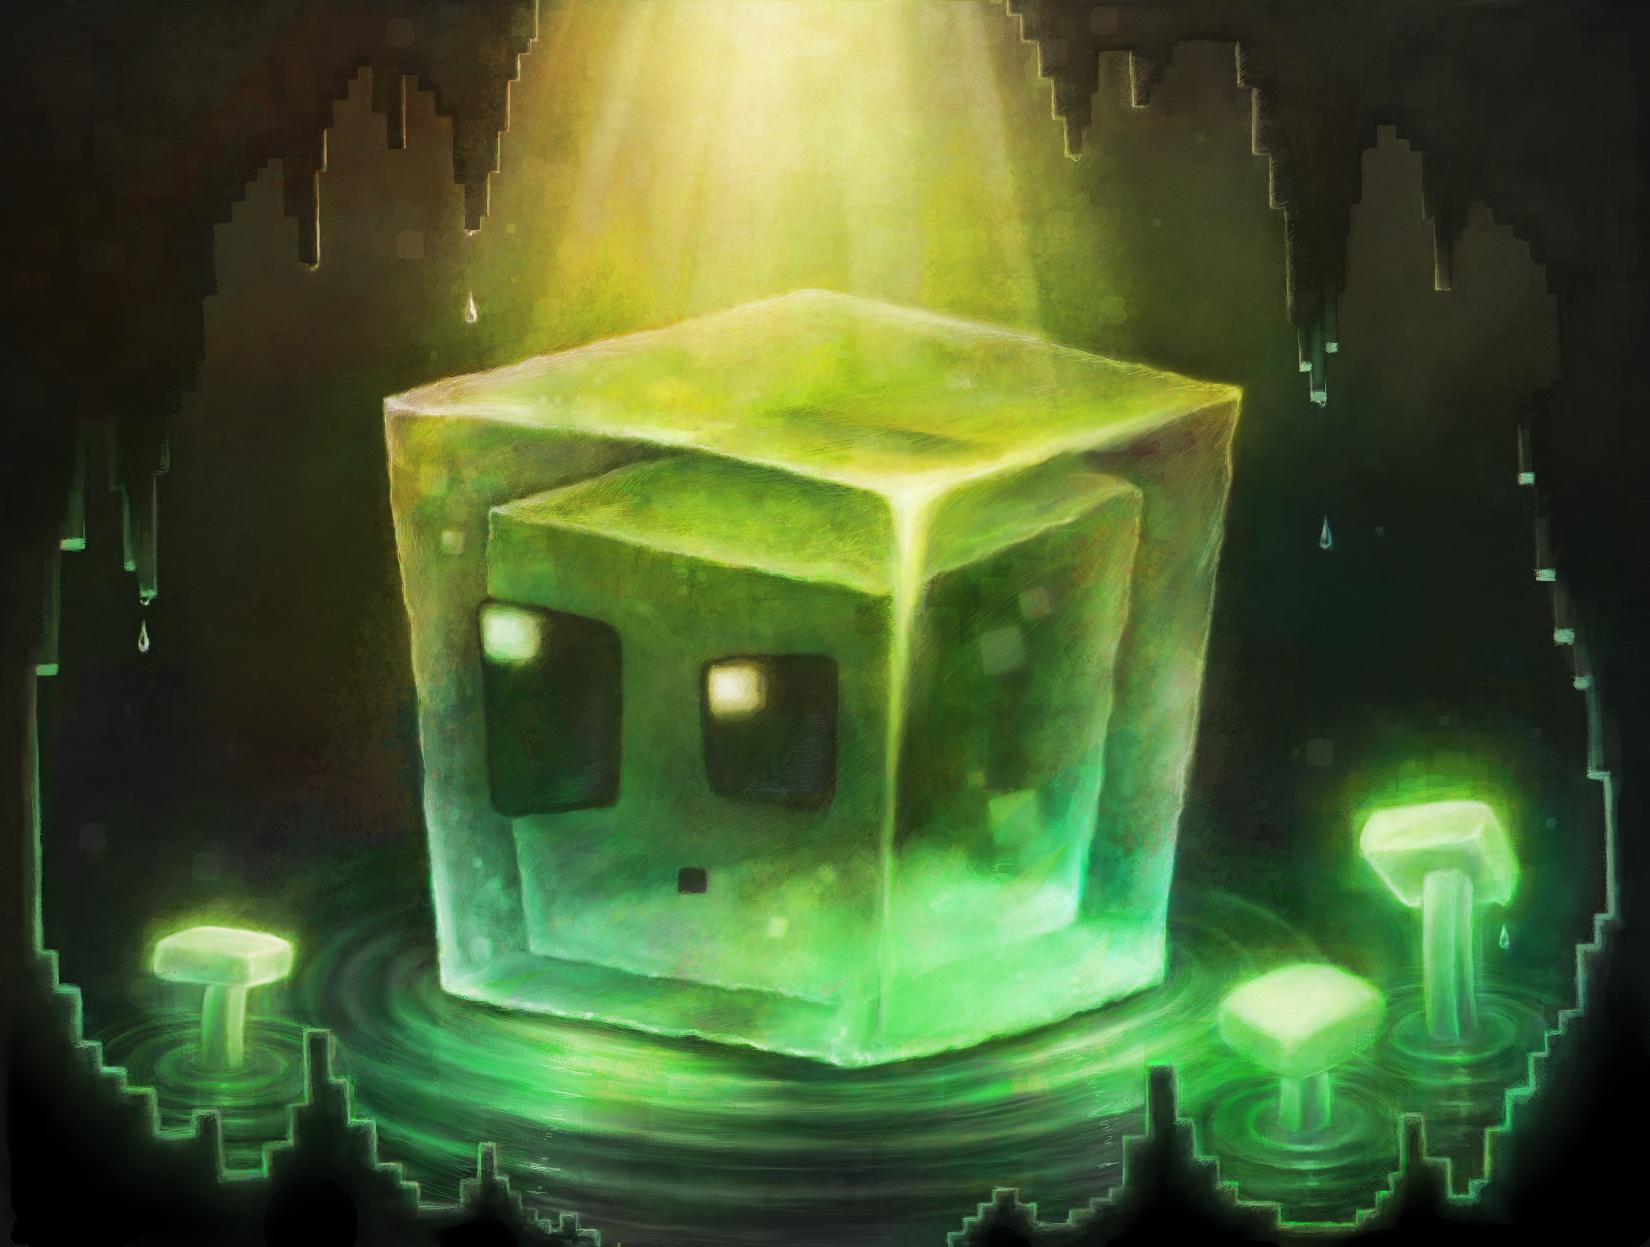 minecraft slime ii by cortoony on deviantart